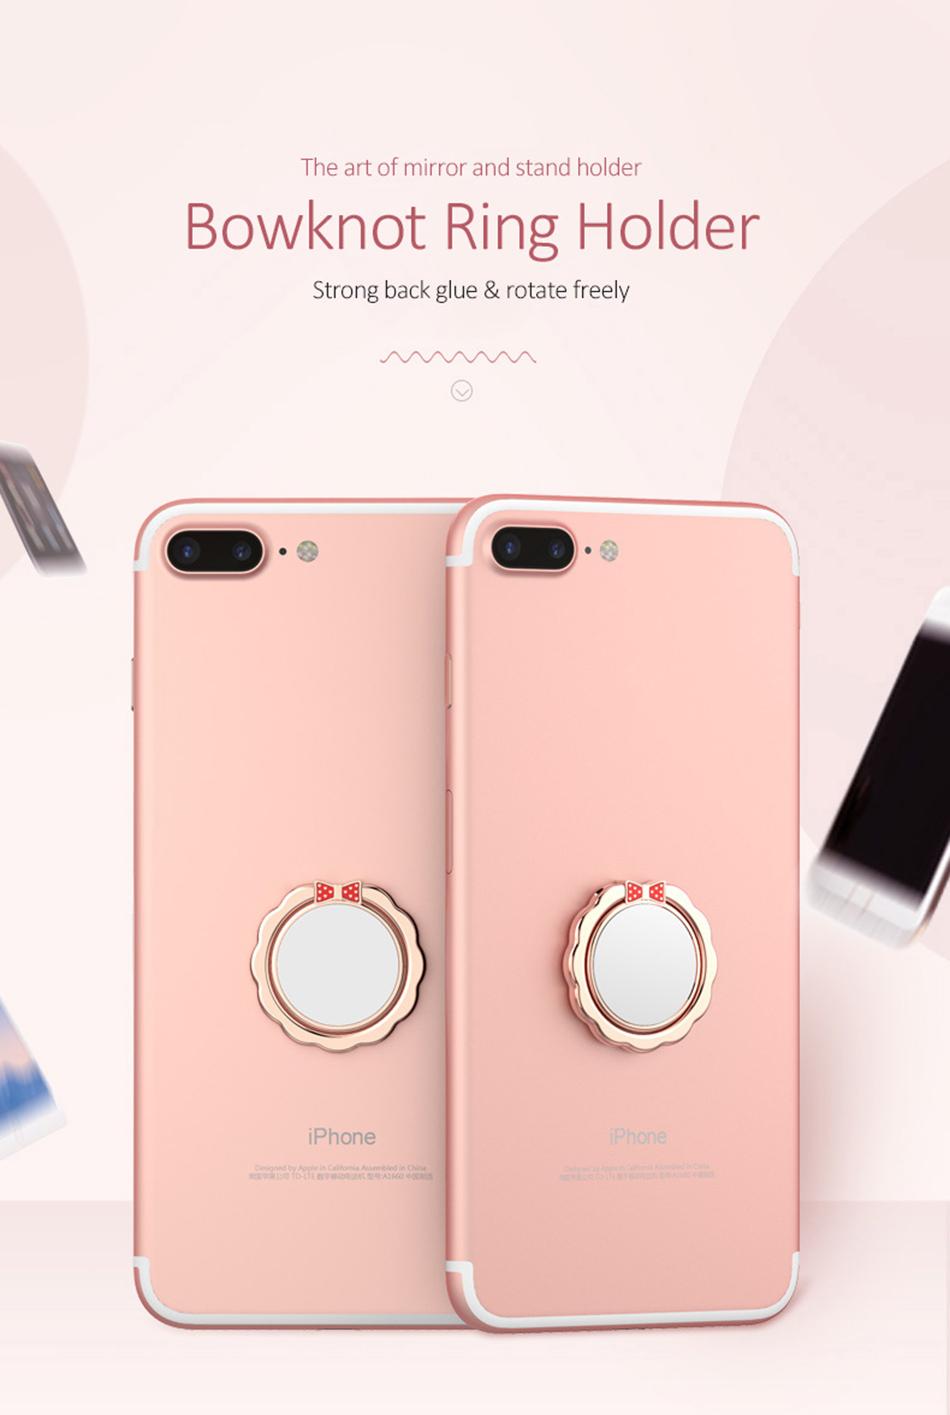 Original H&lOO mirror Ring Bracket Finger Grip Phone Desktop Holder Safe and Firm Built-in Iron Sheet for Most Mobile Phones (1)